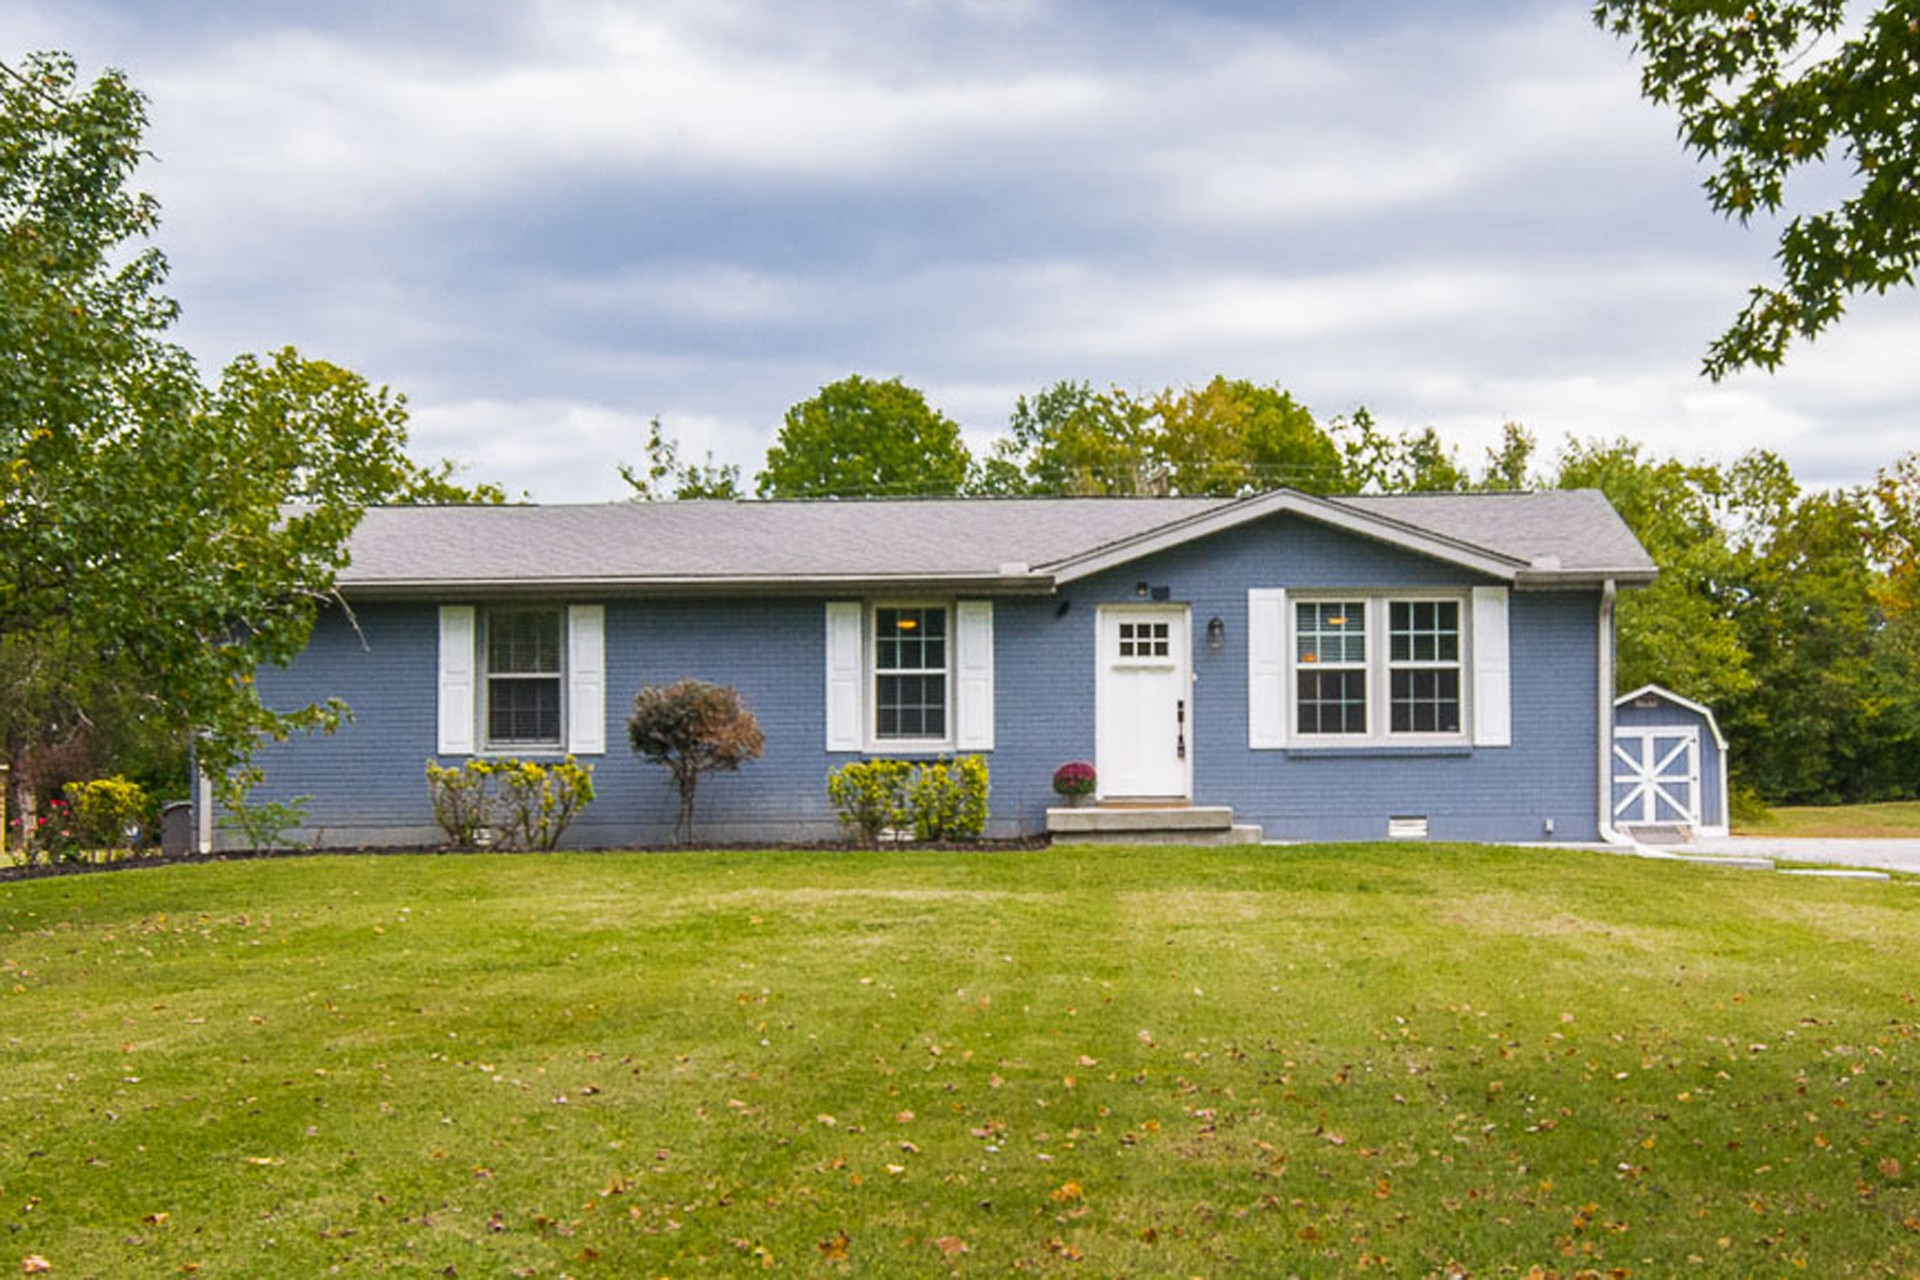 3124 Margie Dr, Joelton, TN 37080 - Joelton, TN real estate listing